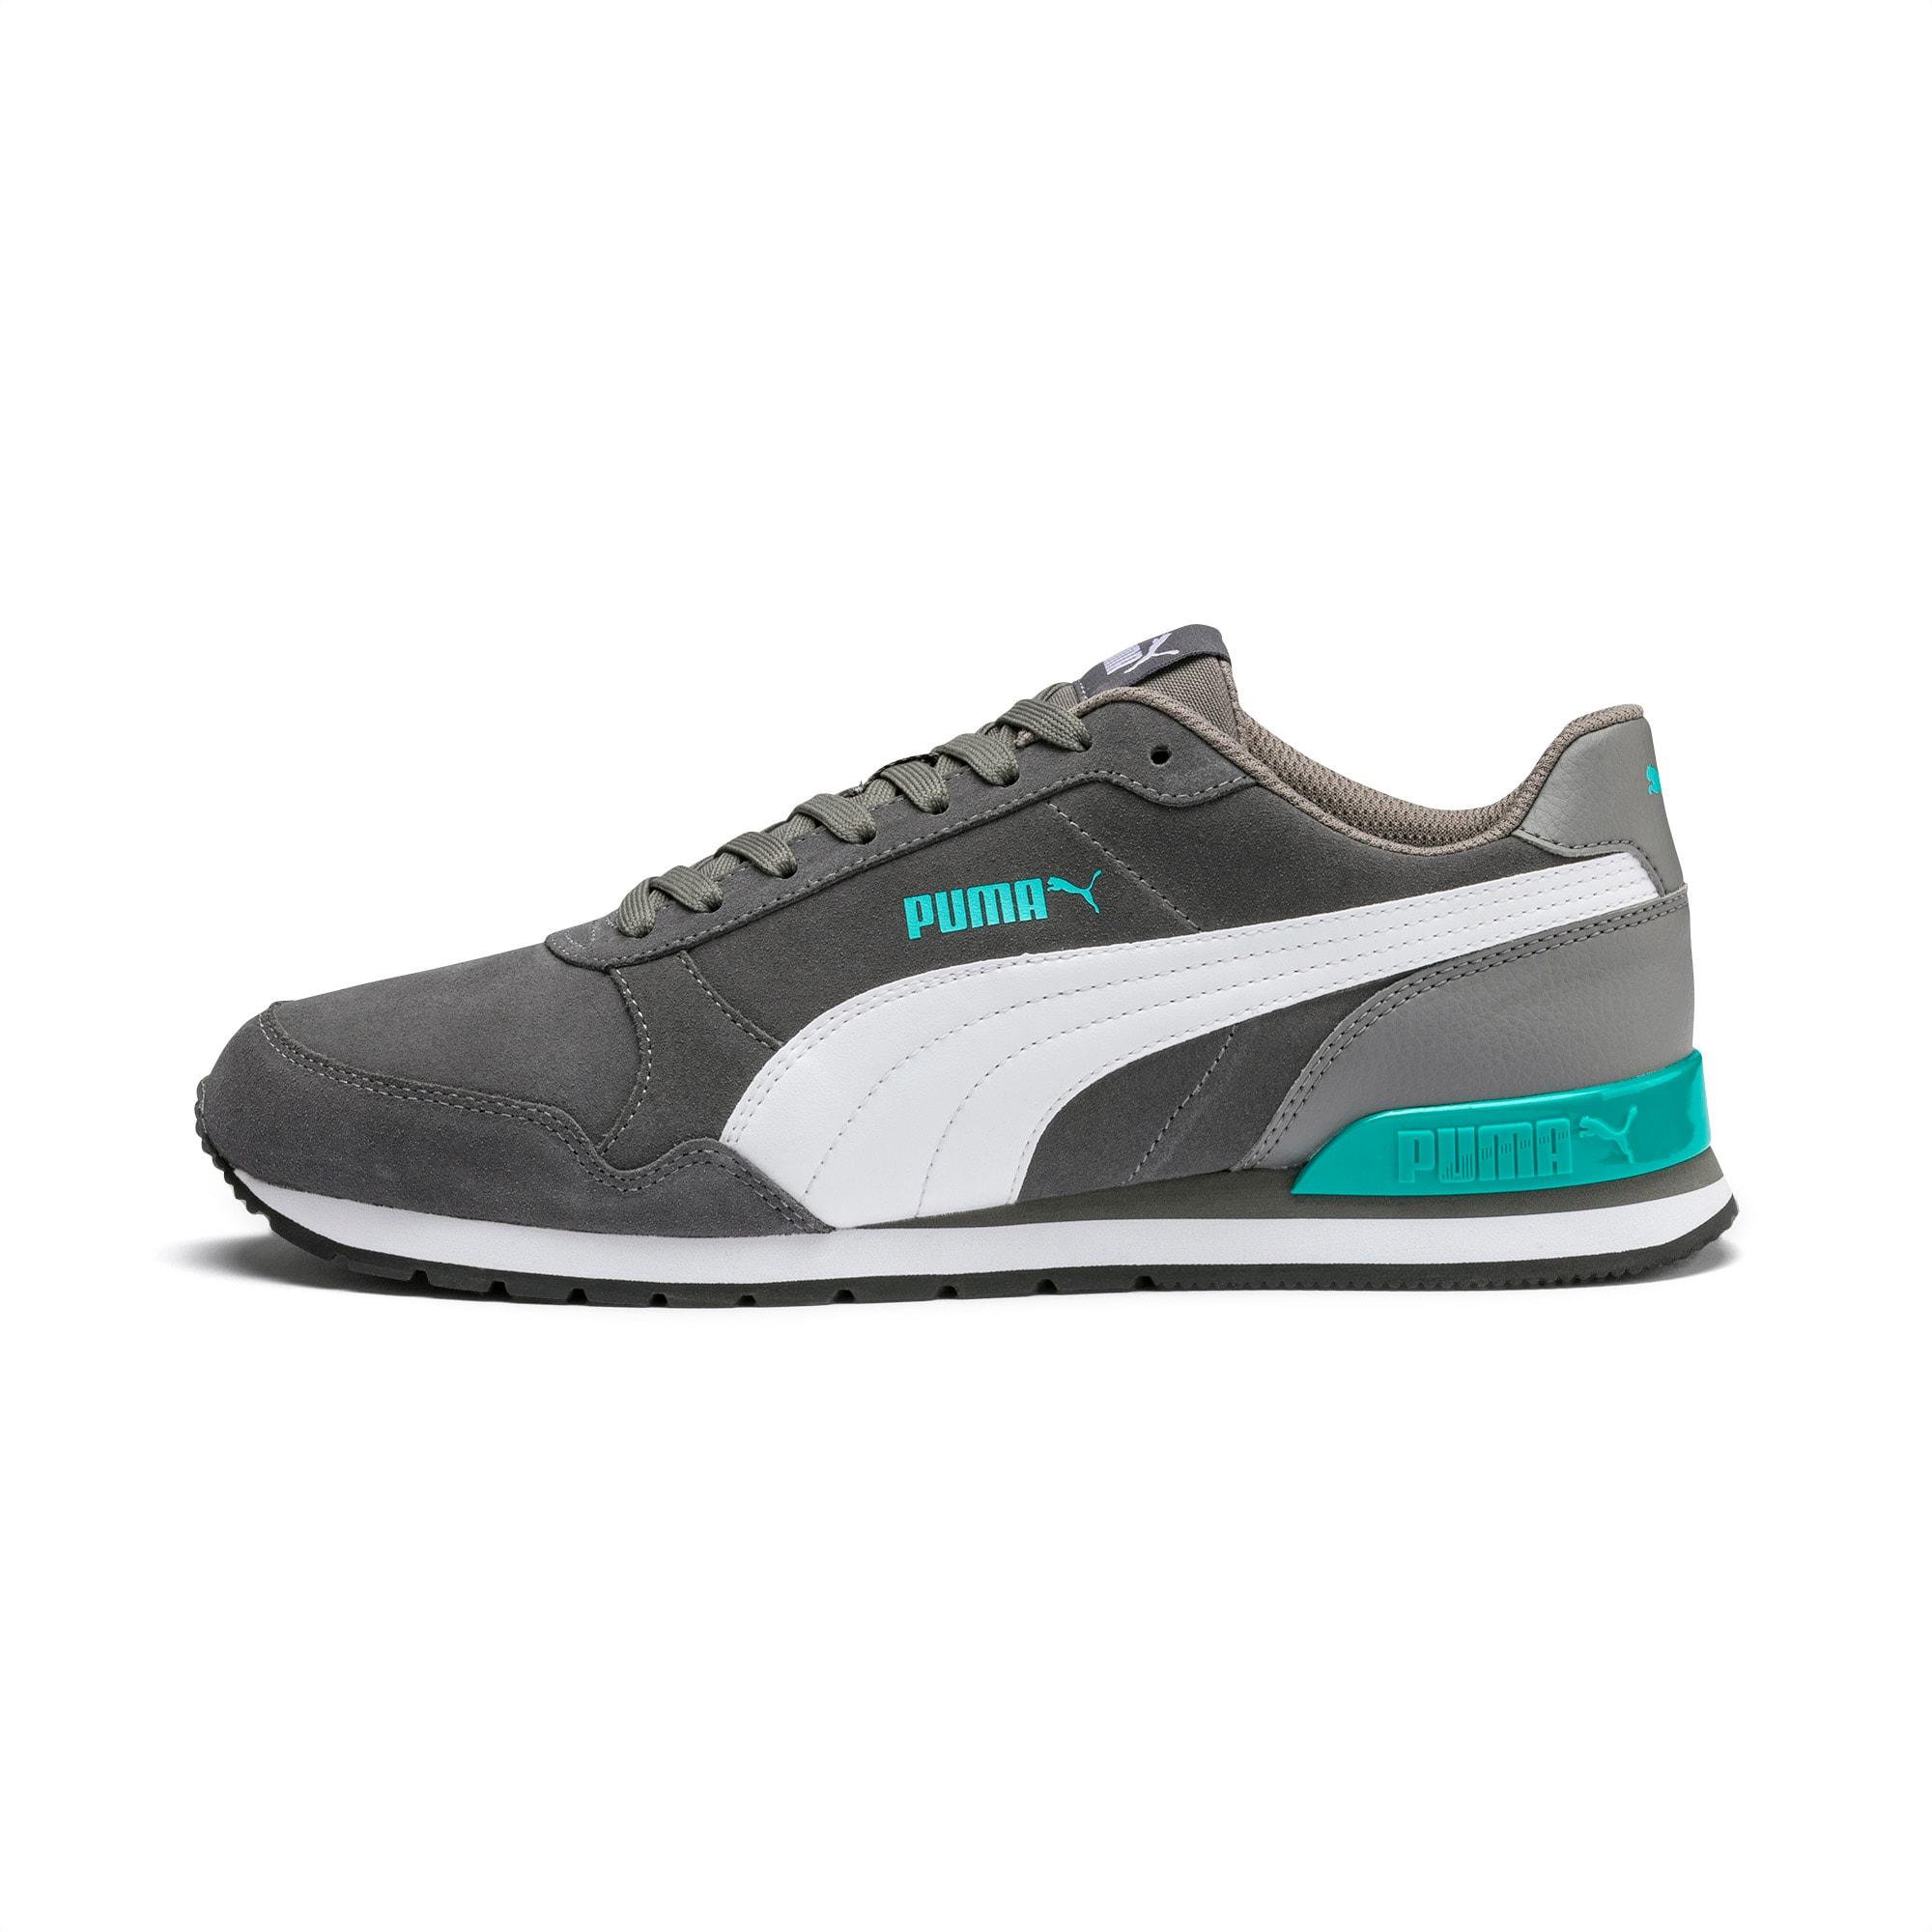 ST Runner v2 Suede Men's Sneakers